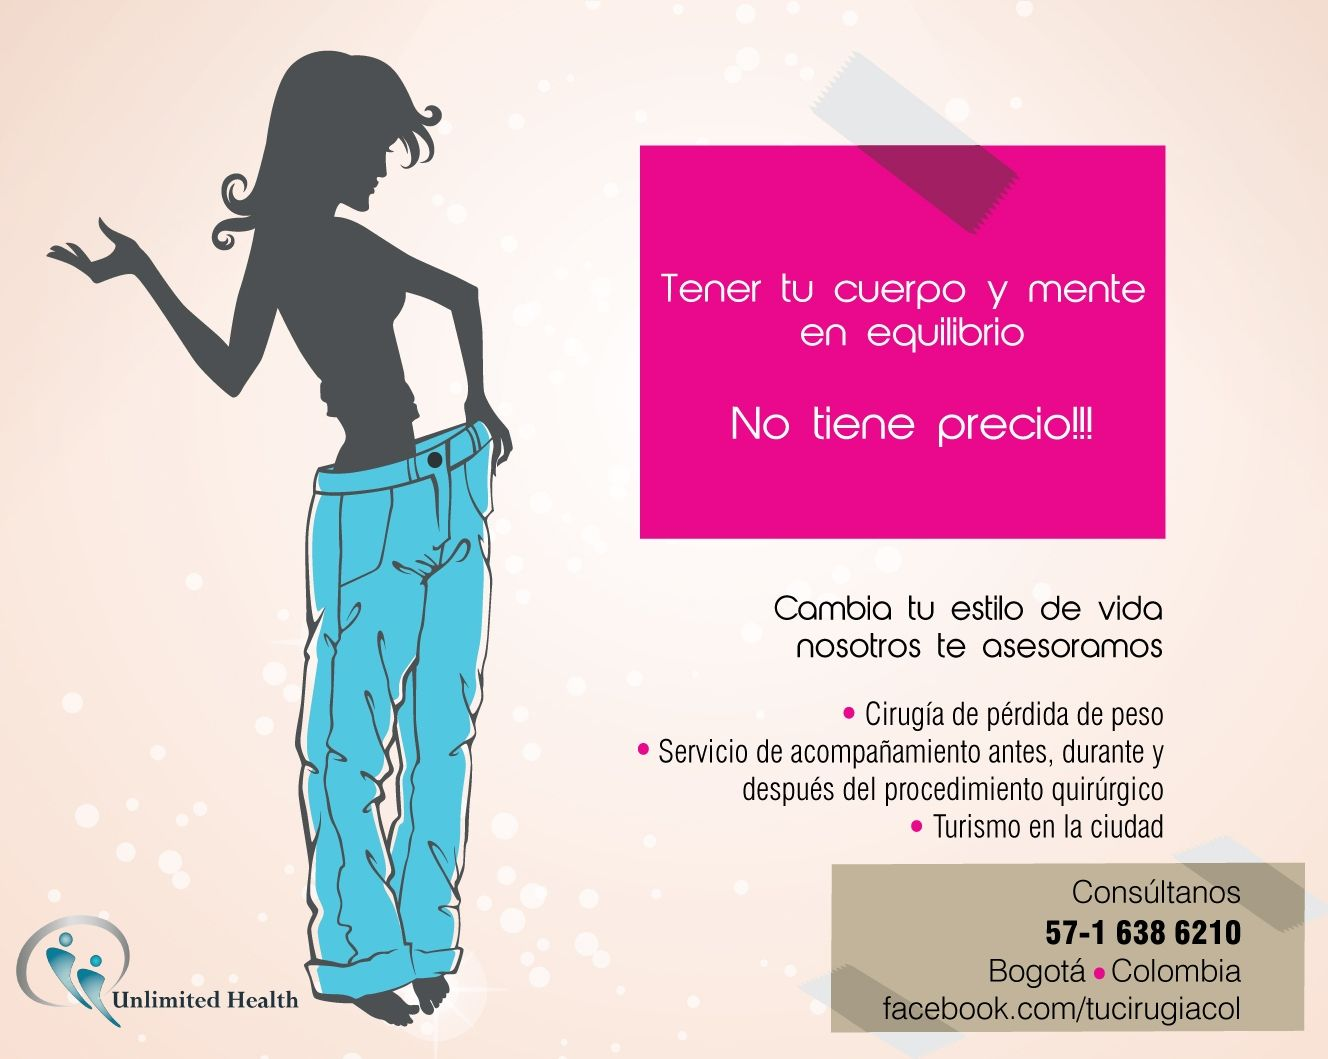 Perdida de peso, cirugia, estetica, belleza, turismo..